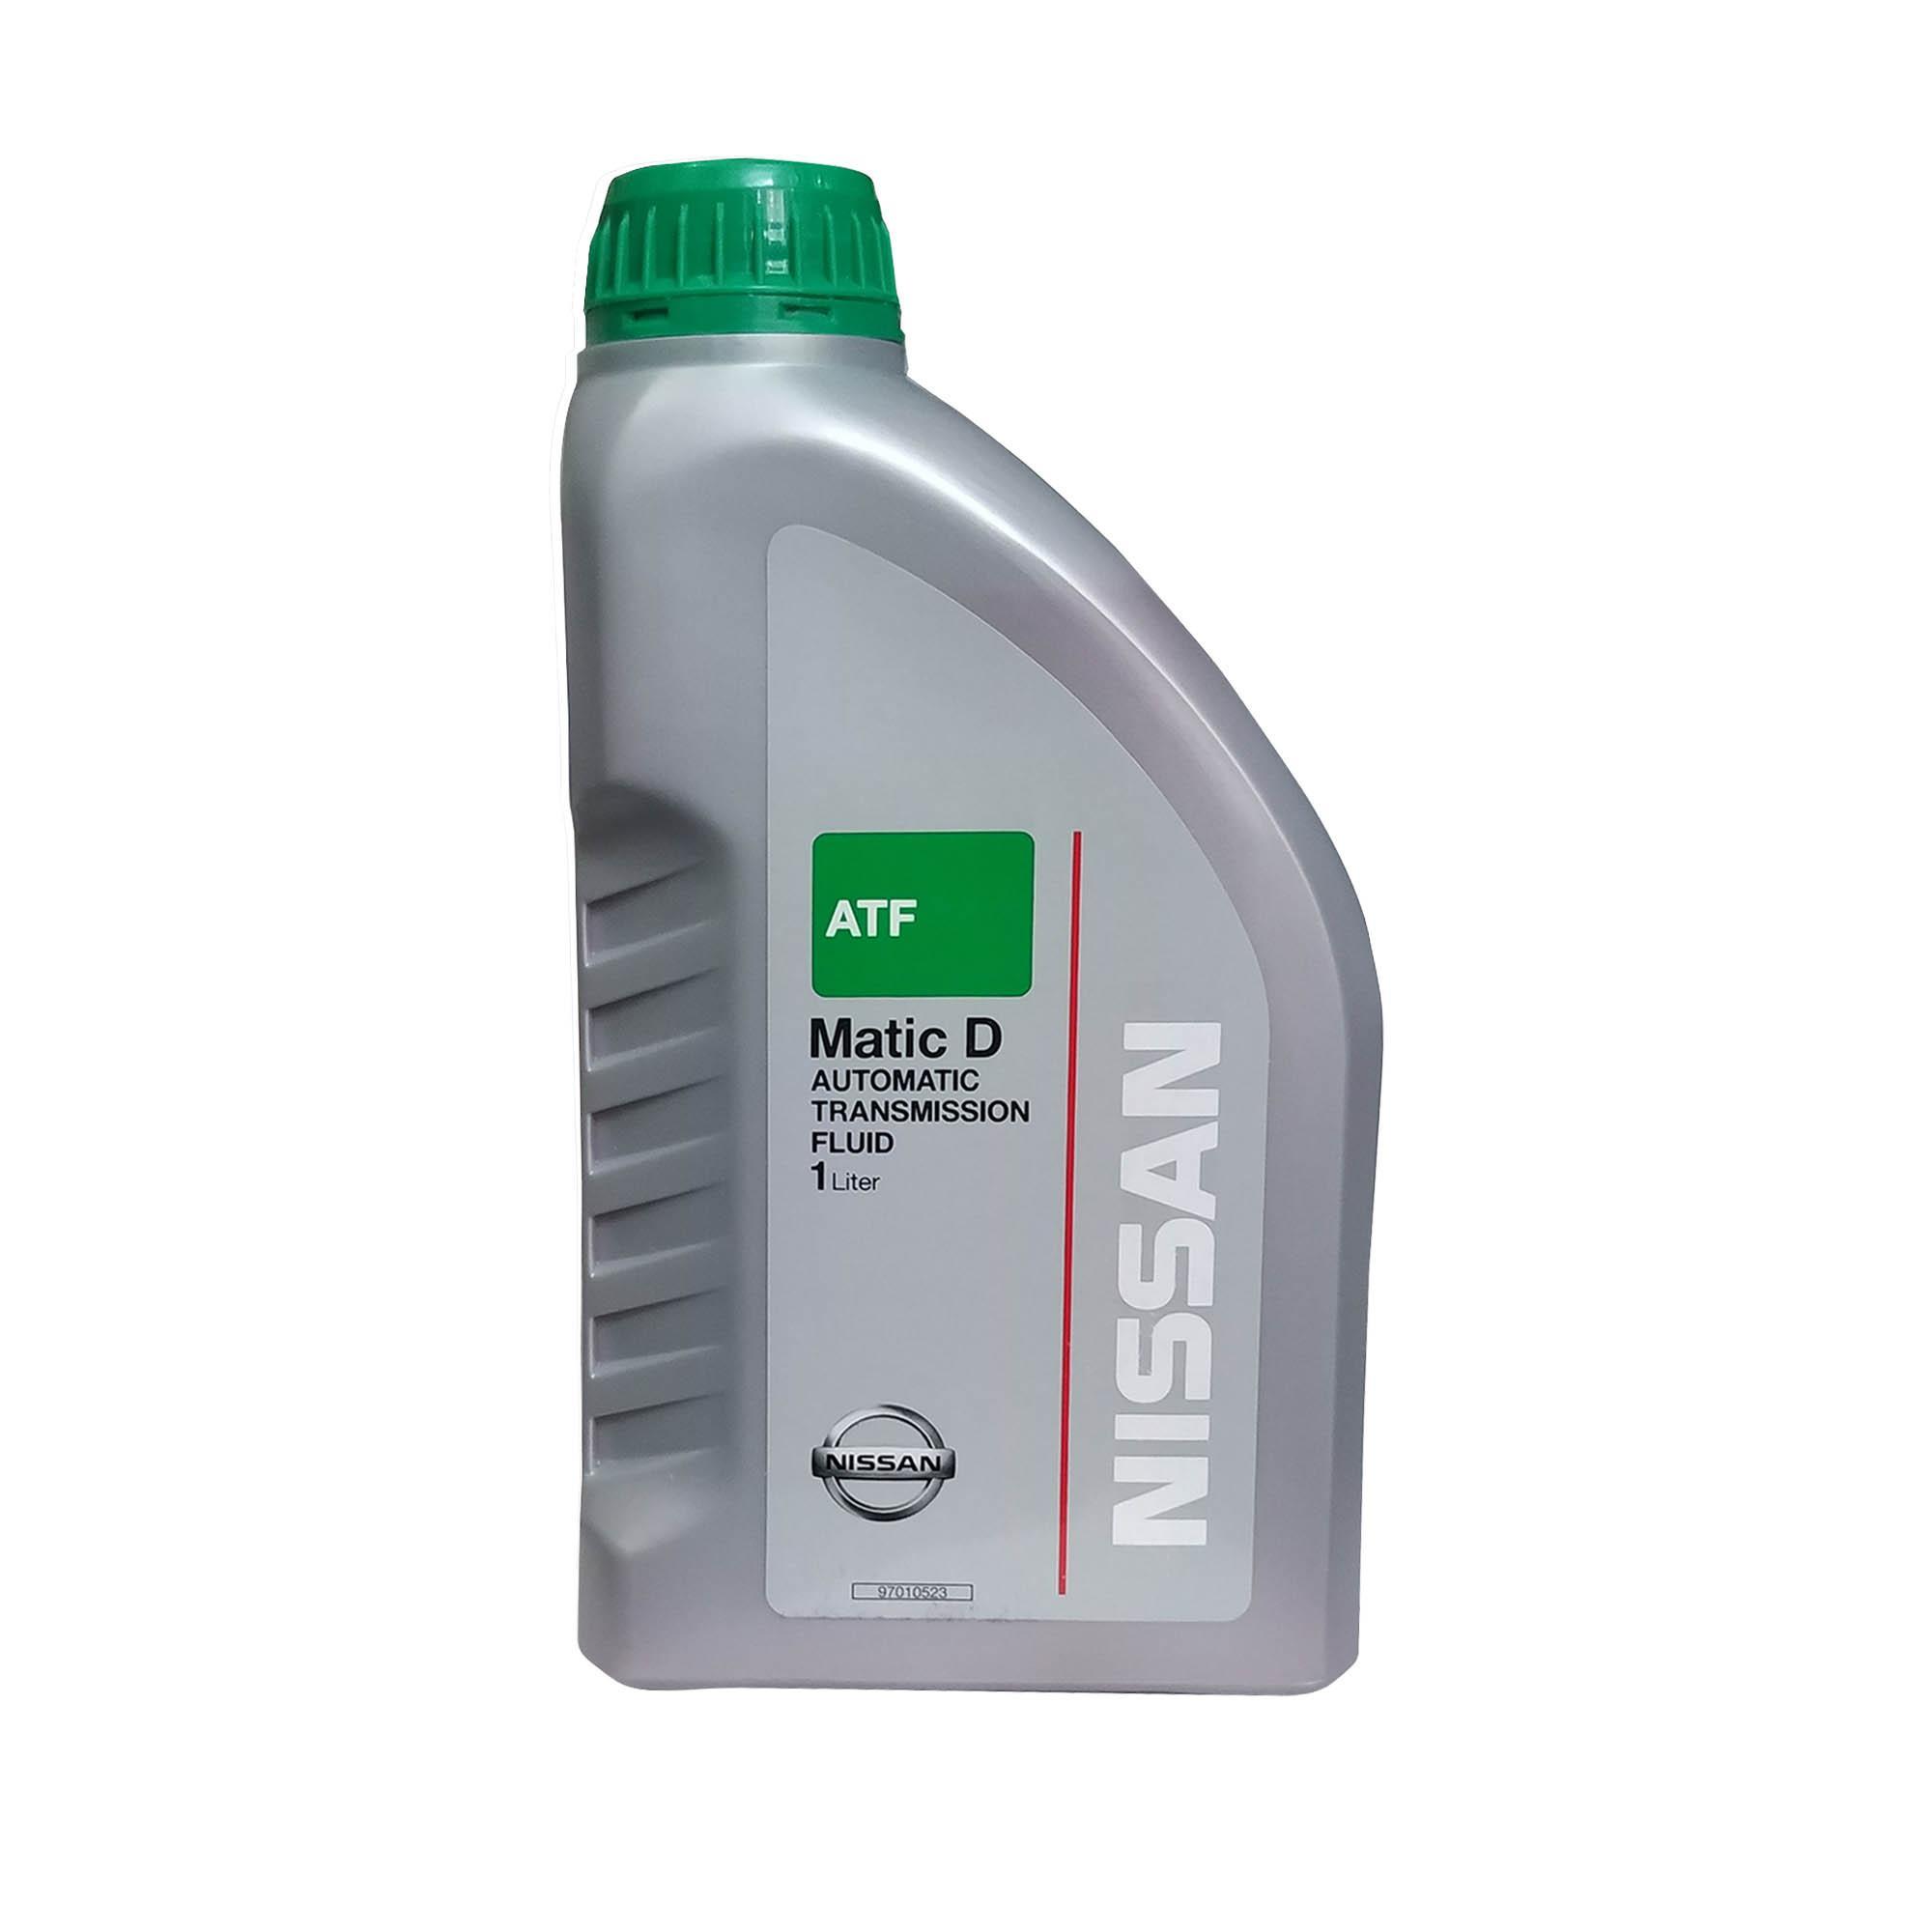 NISSAN Matic D Automatic Transmission Fluid ( ATF ) 1L ( 1 Liter )